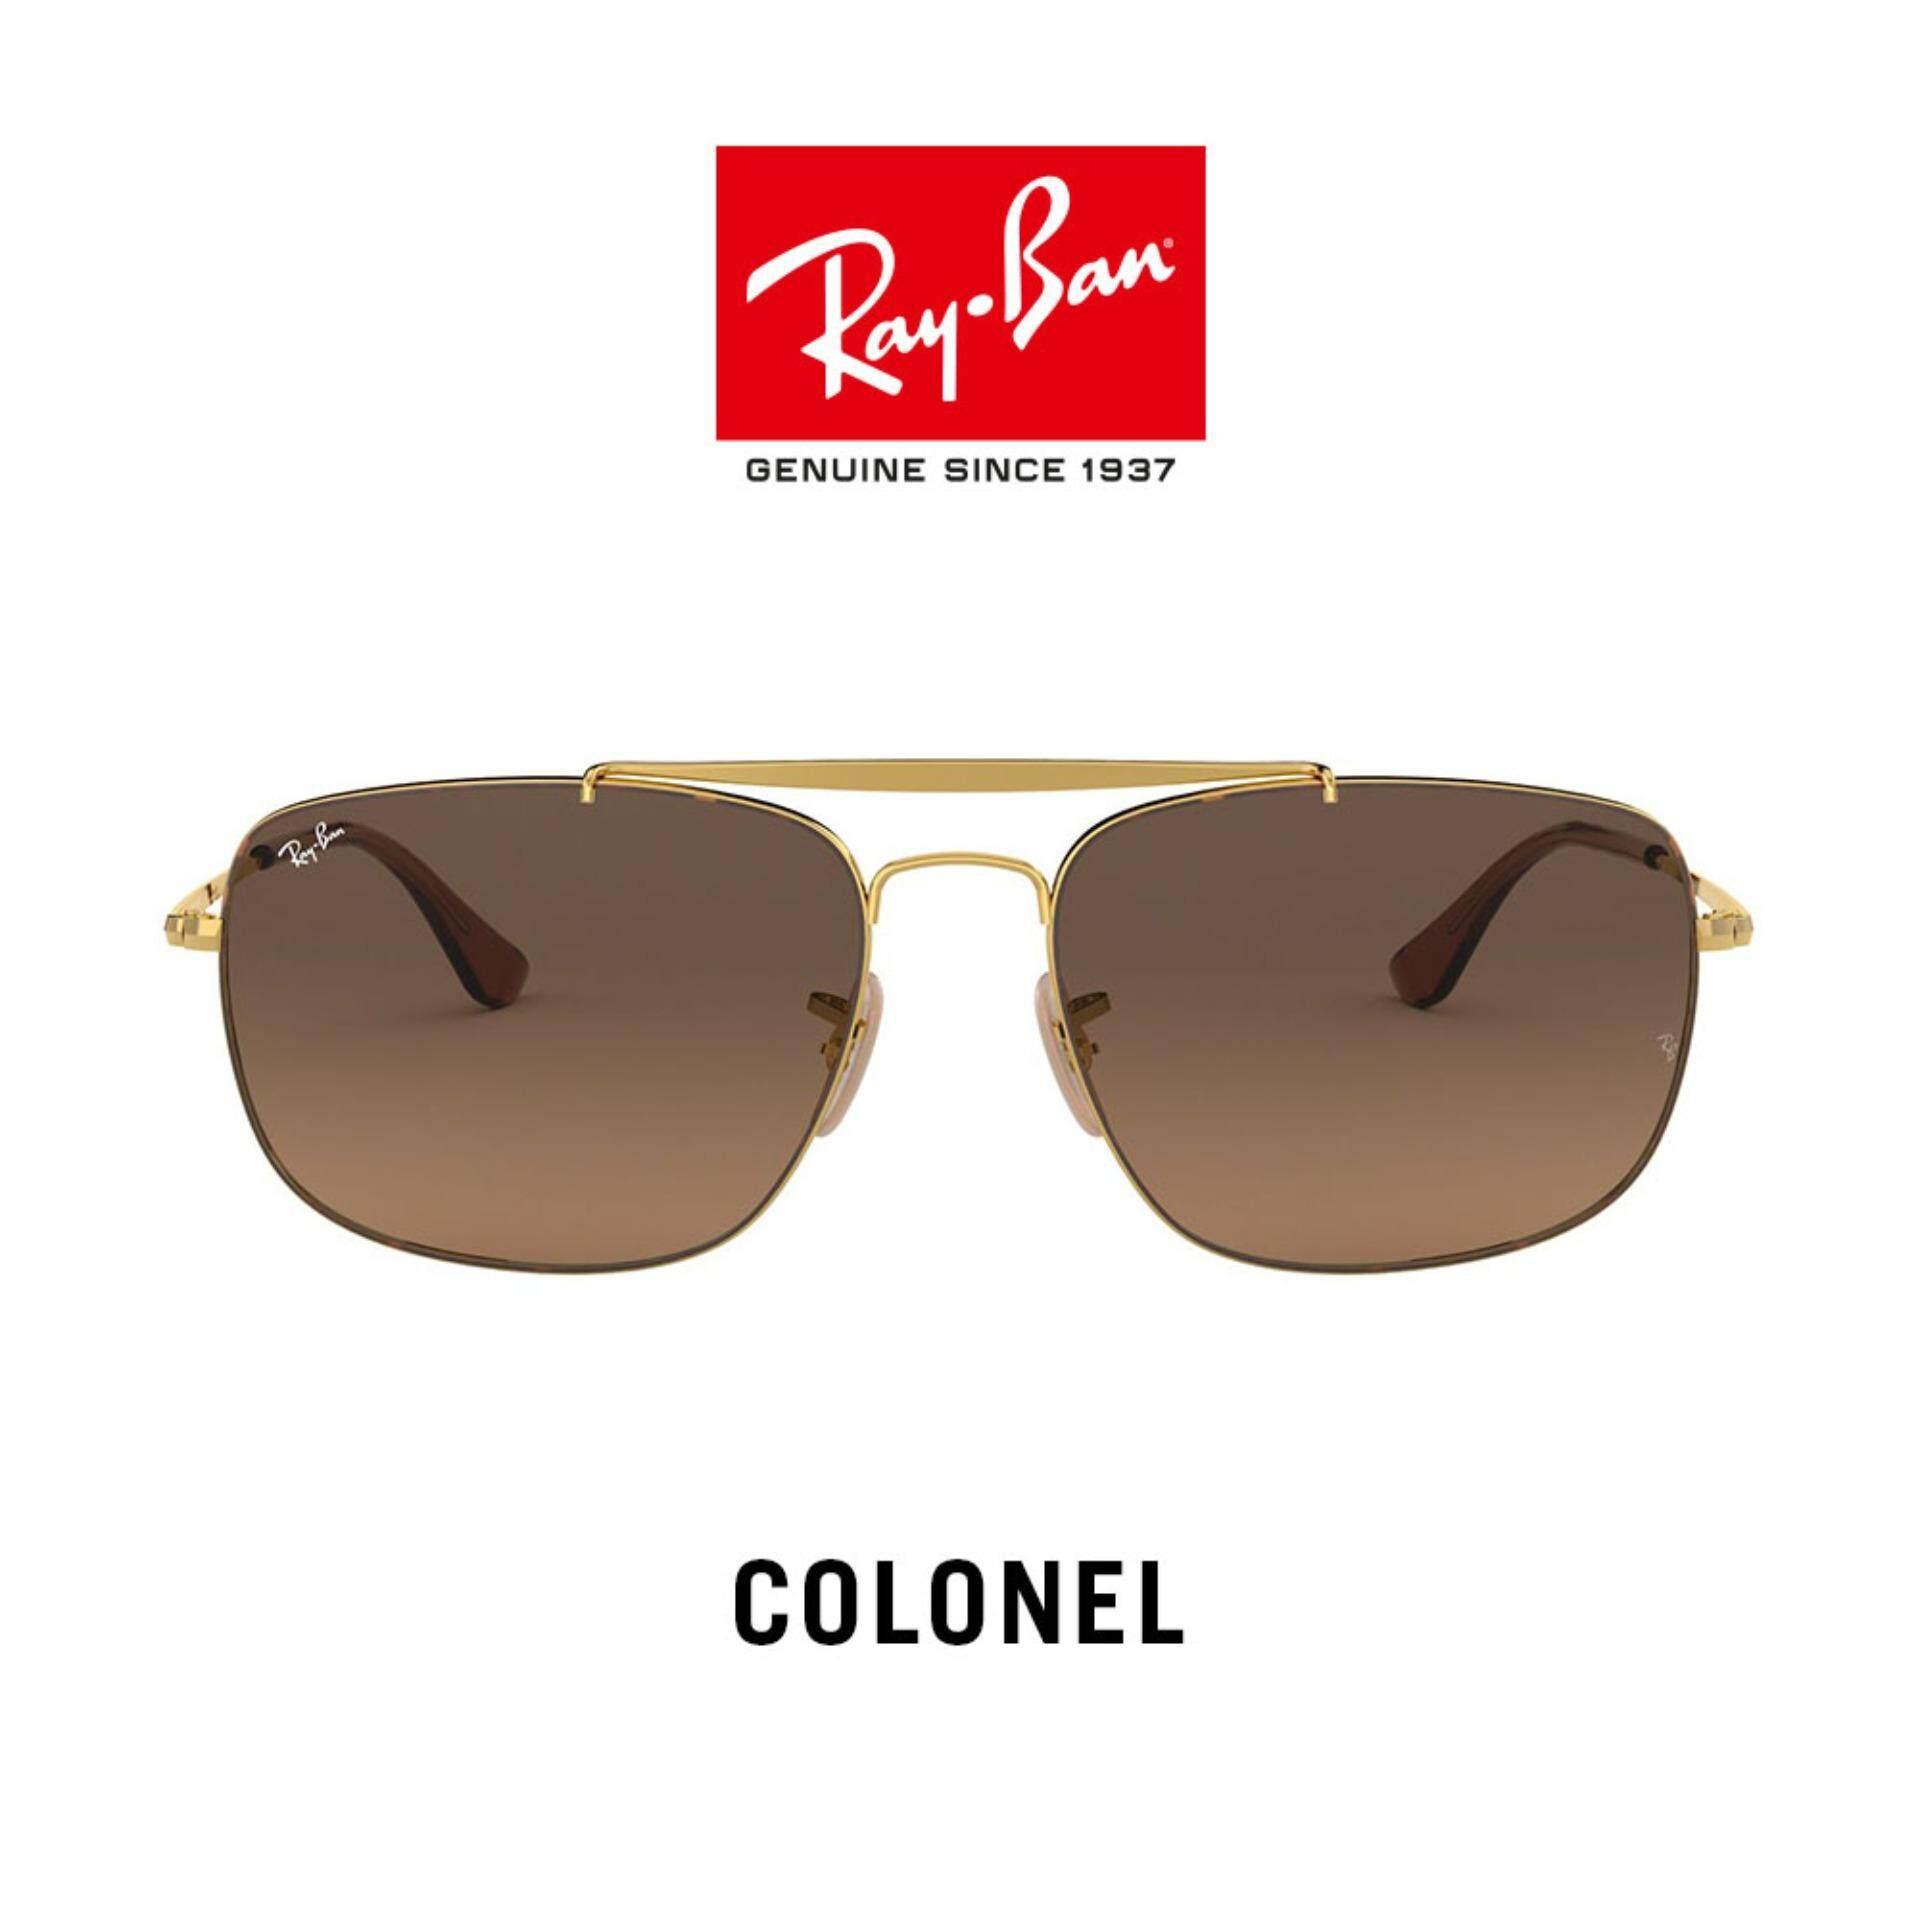 Ray-Ban The Colonel - 0rb3560 910443  แว่นตากันแดด.